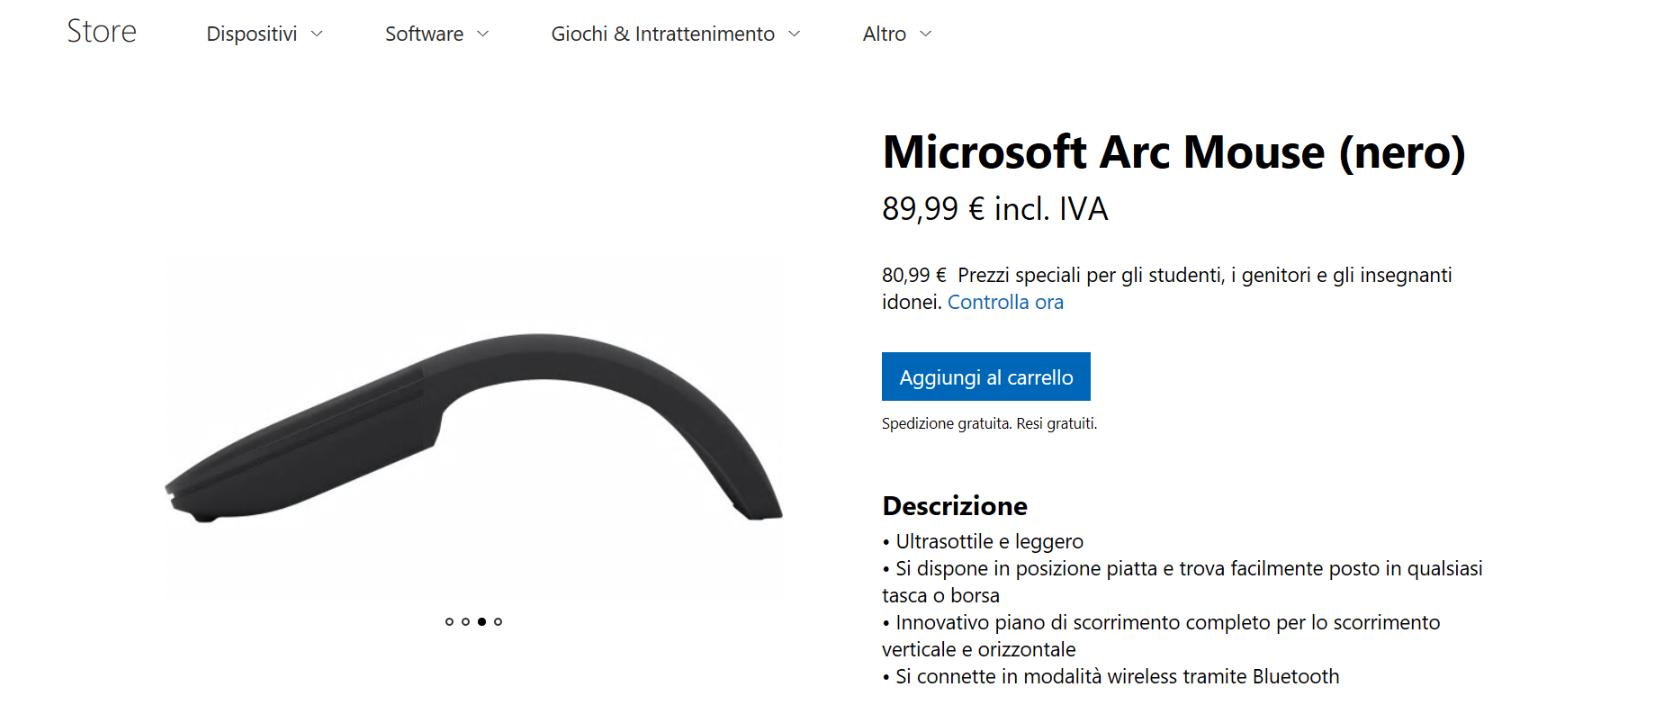 Microsoft Arc Mouse Nero